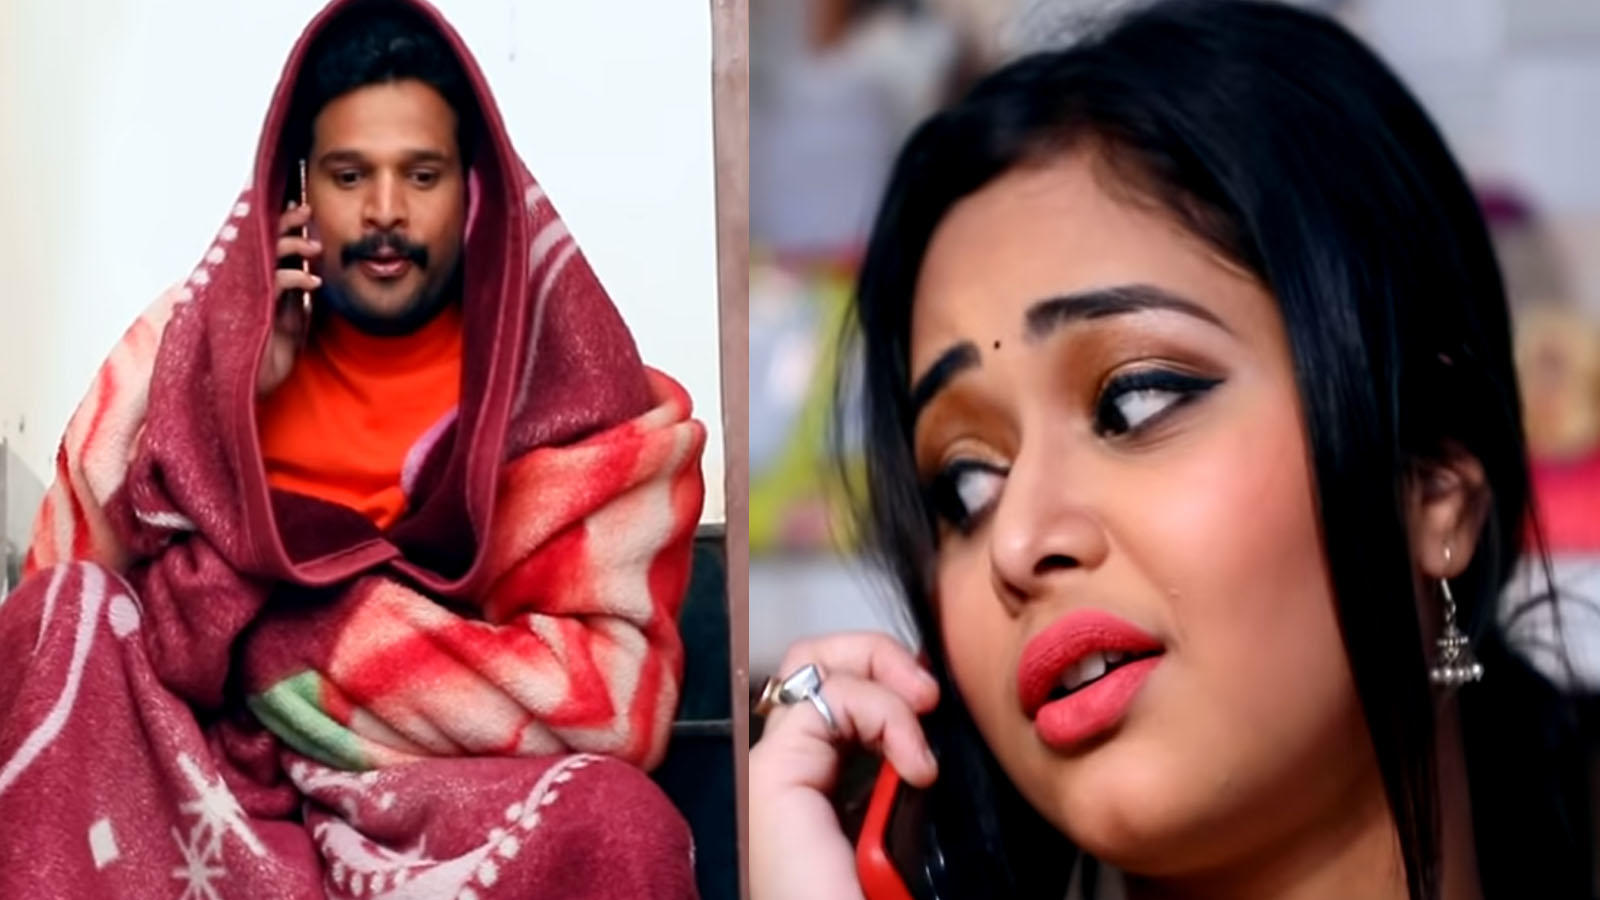 Bhojpuri song 2020: Ritesh Pandey's first rap song 'Hello Kaun' garners 400  million views on YouTube, singer thanks fans! | Bhojpuri Video Songs -  Times of India